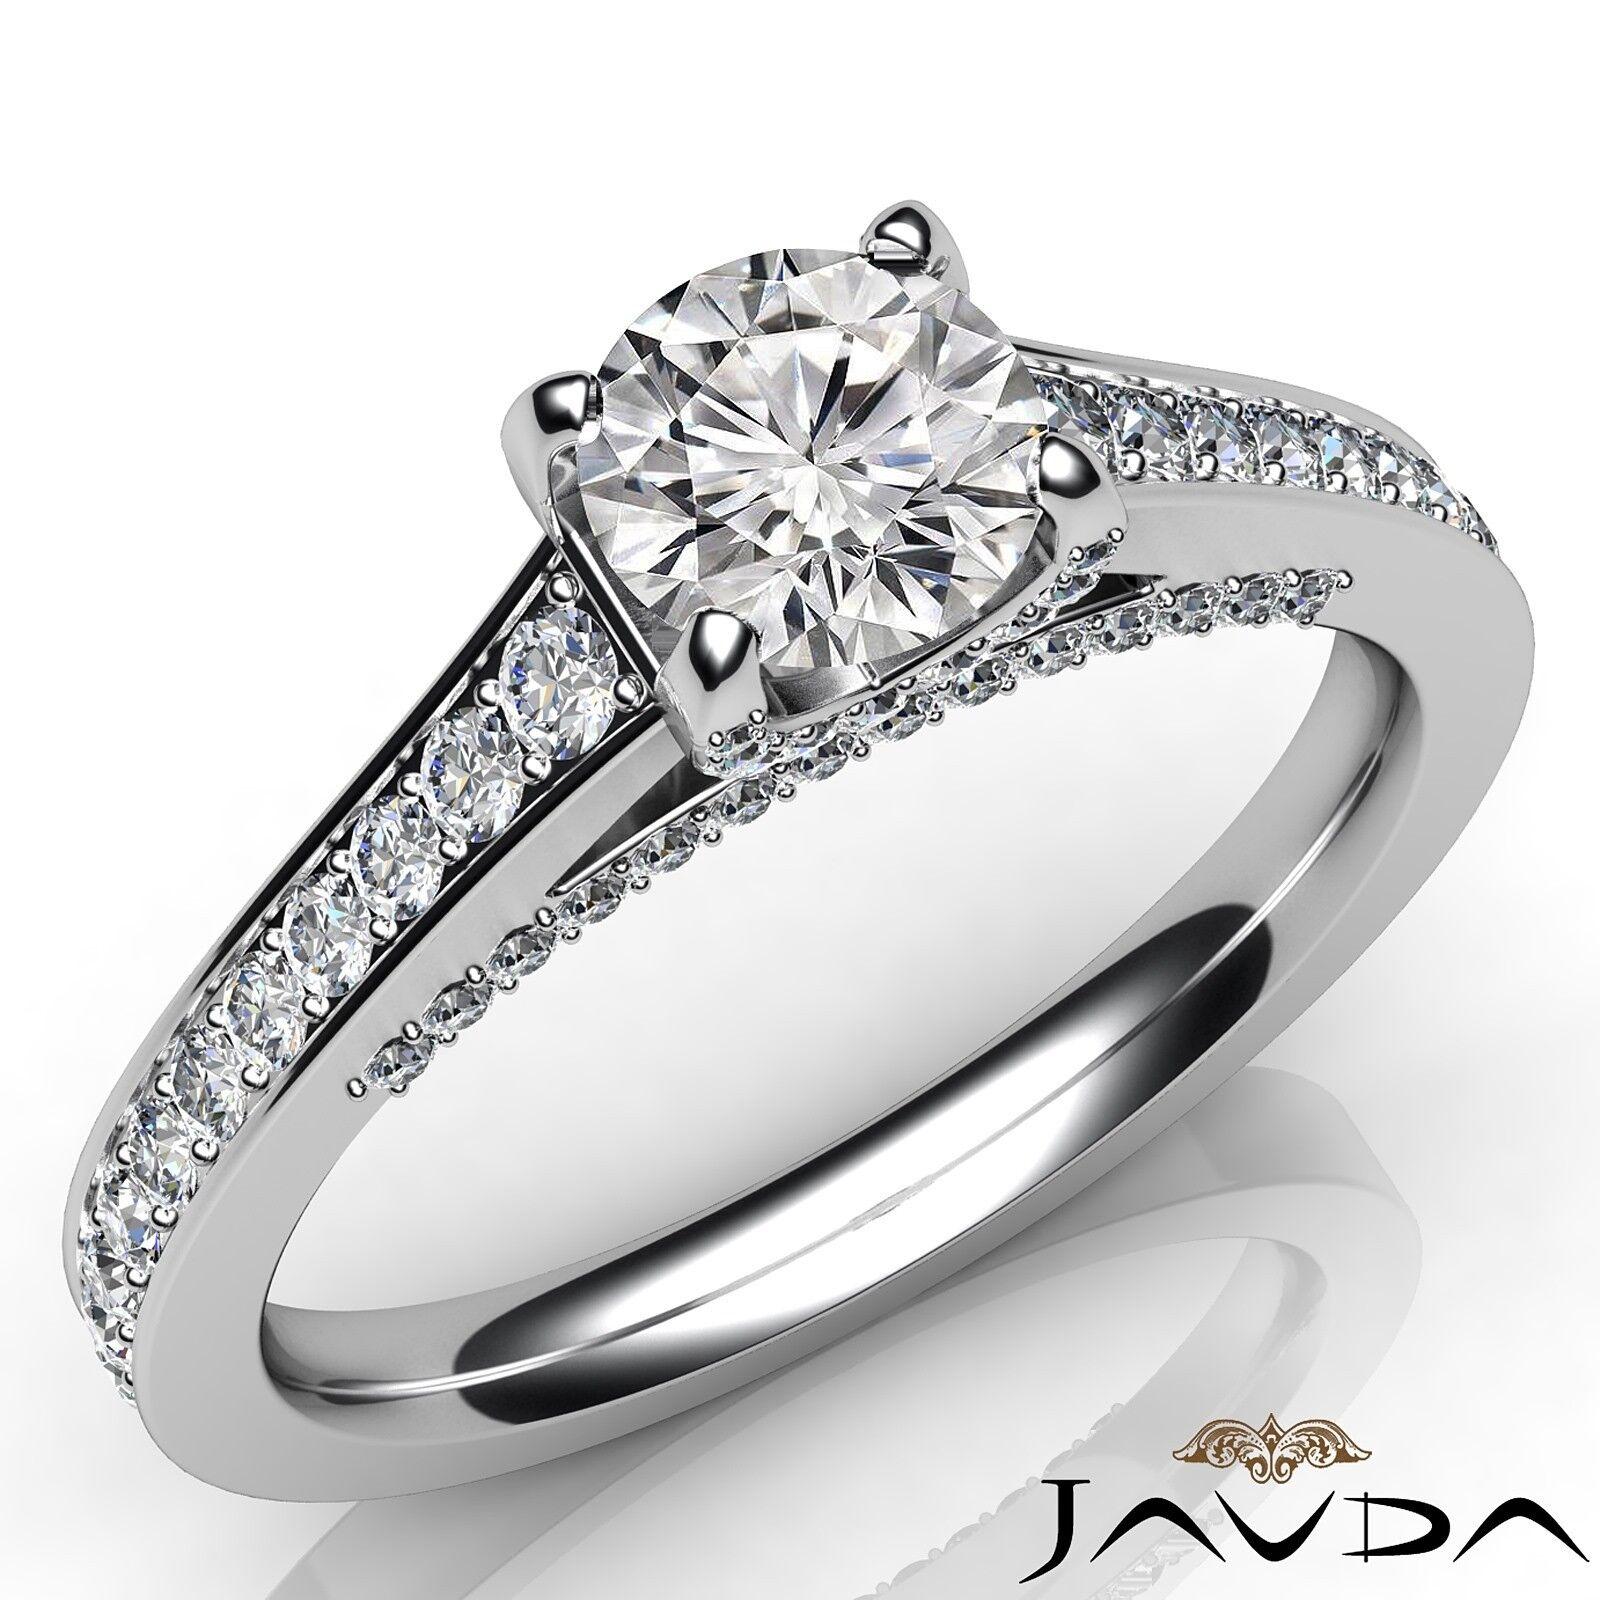 1.56ctw Bridge Accent Round Diamond Engagement Ring GIA K-VVS1 White Gold Rings